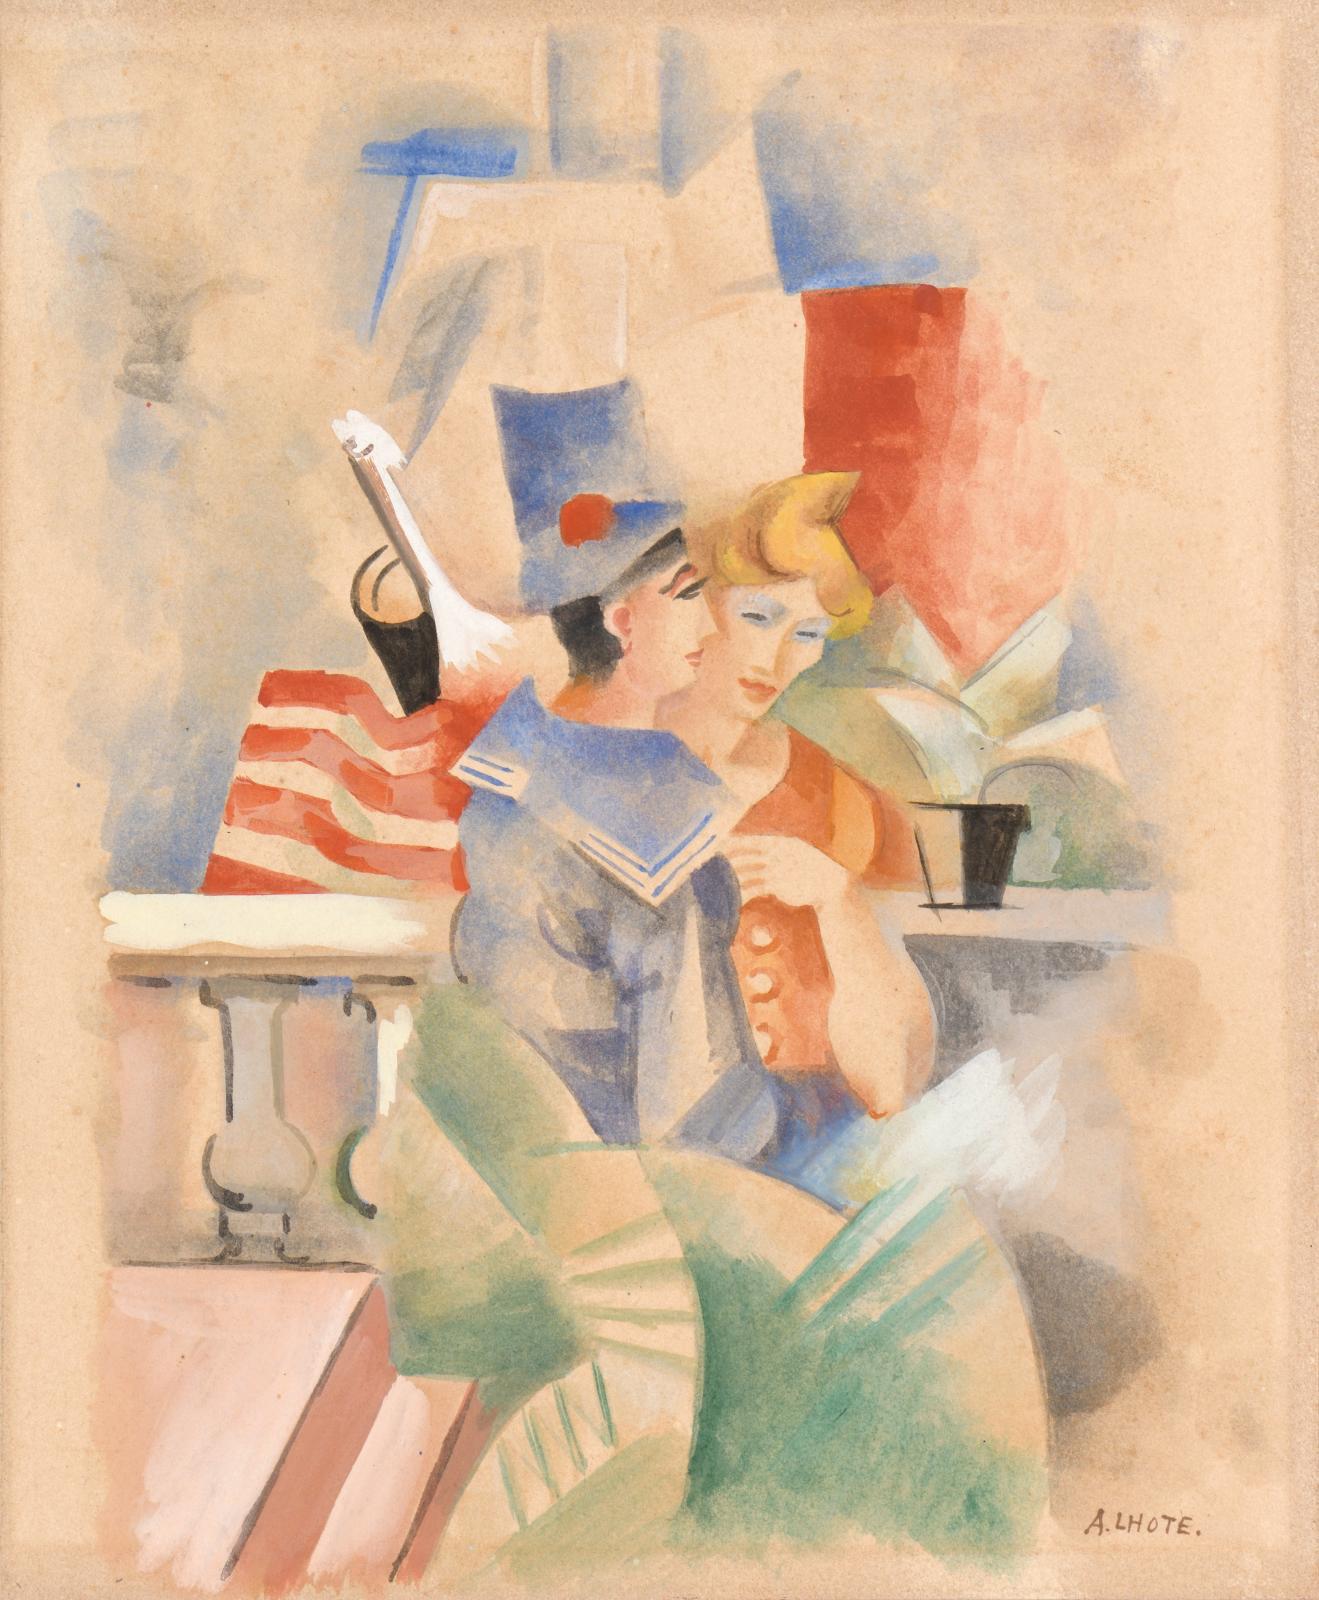 André Lhote (1885-1962), Illustration for Chansons de bord (Sea Songs), watercolor and gouache, 24.5 x 20.3 cm/9.4 x 7.8 in.Estimate: €3,0